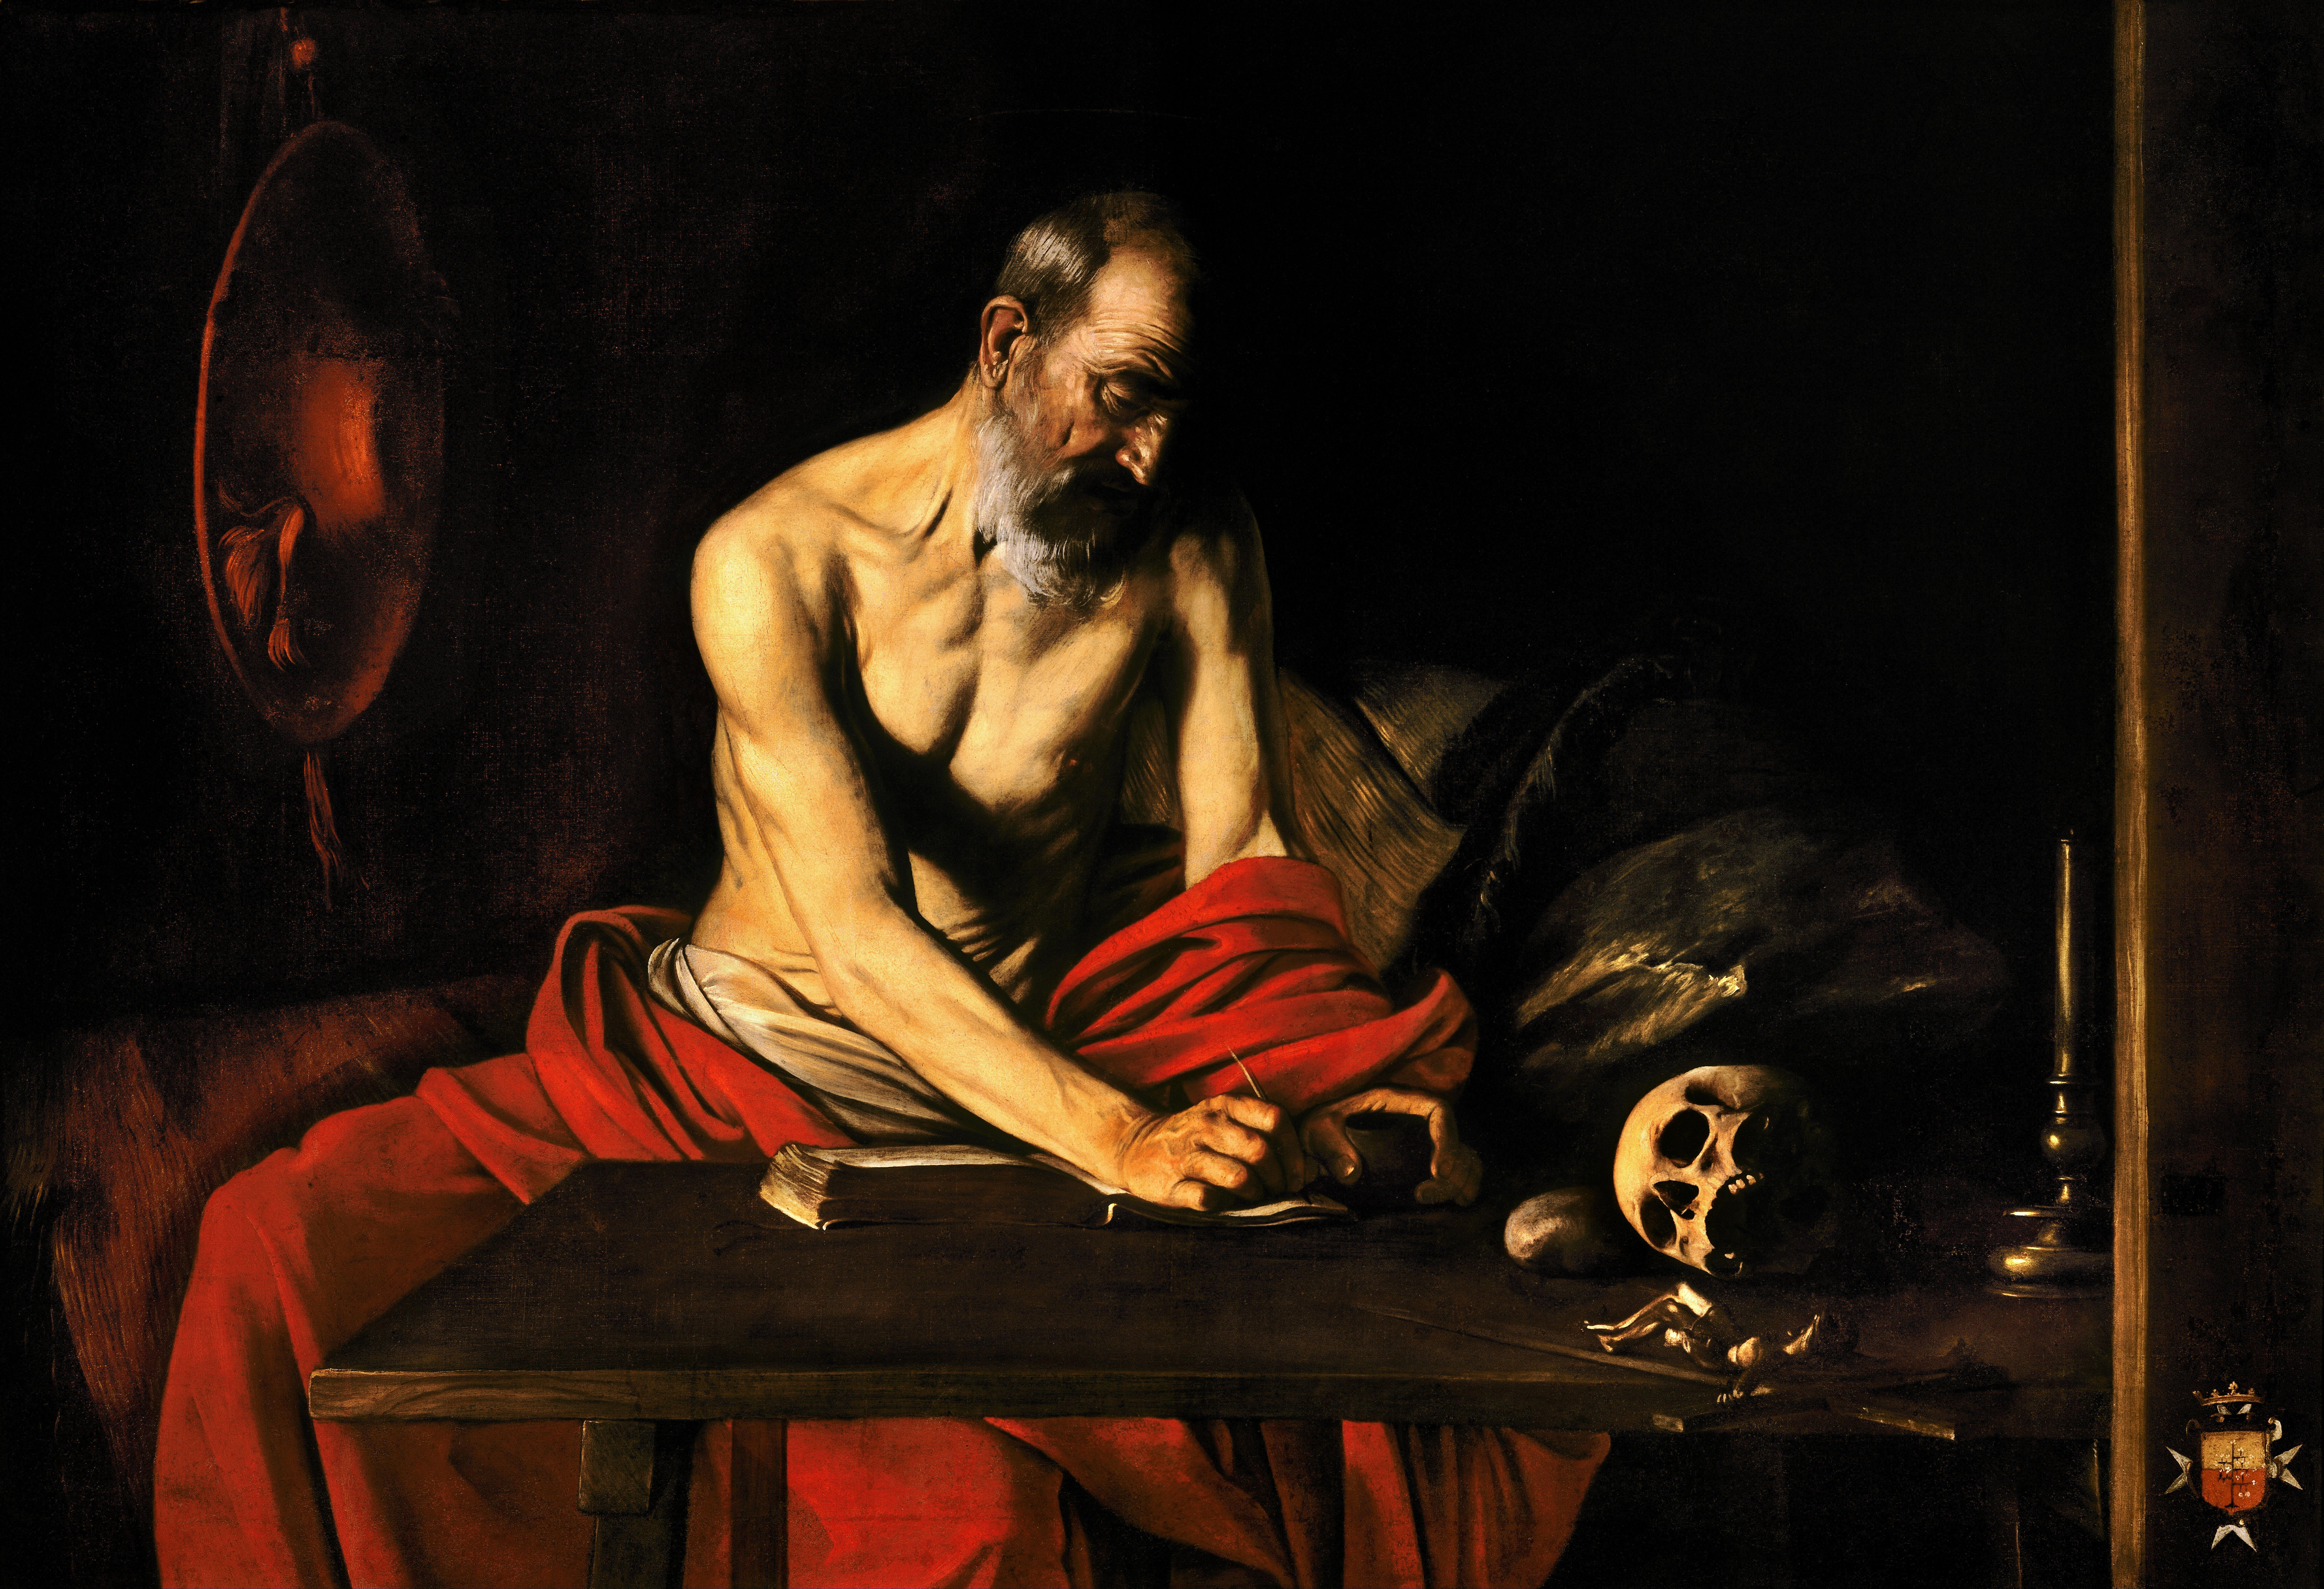 Saint jerome writing 1605 - by Caravaggio